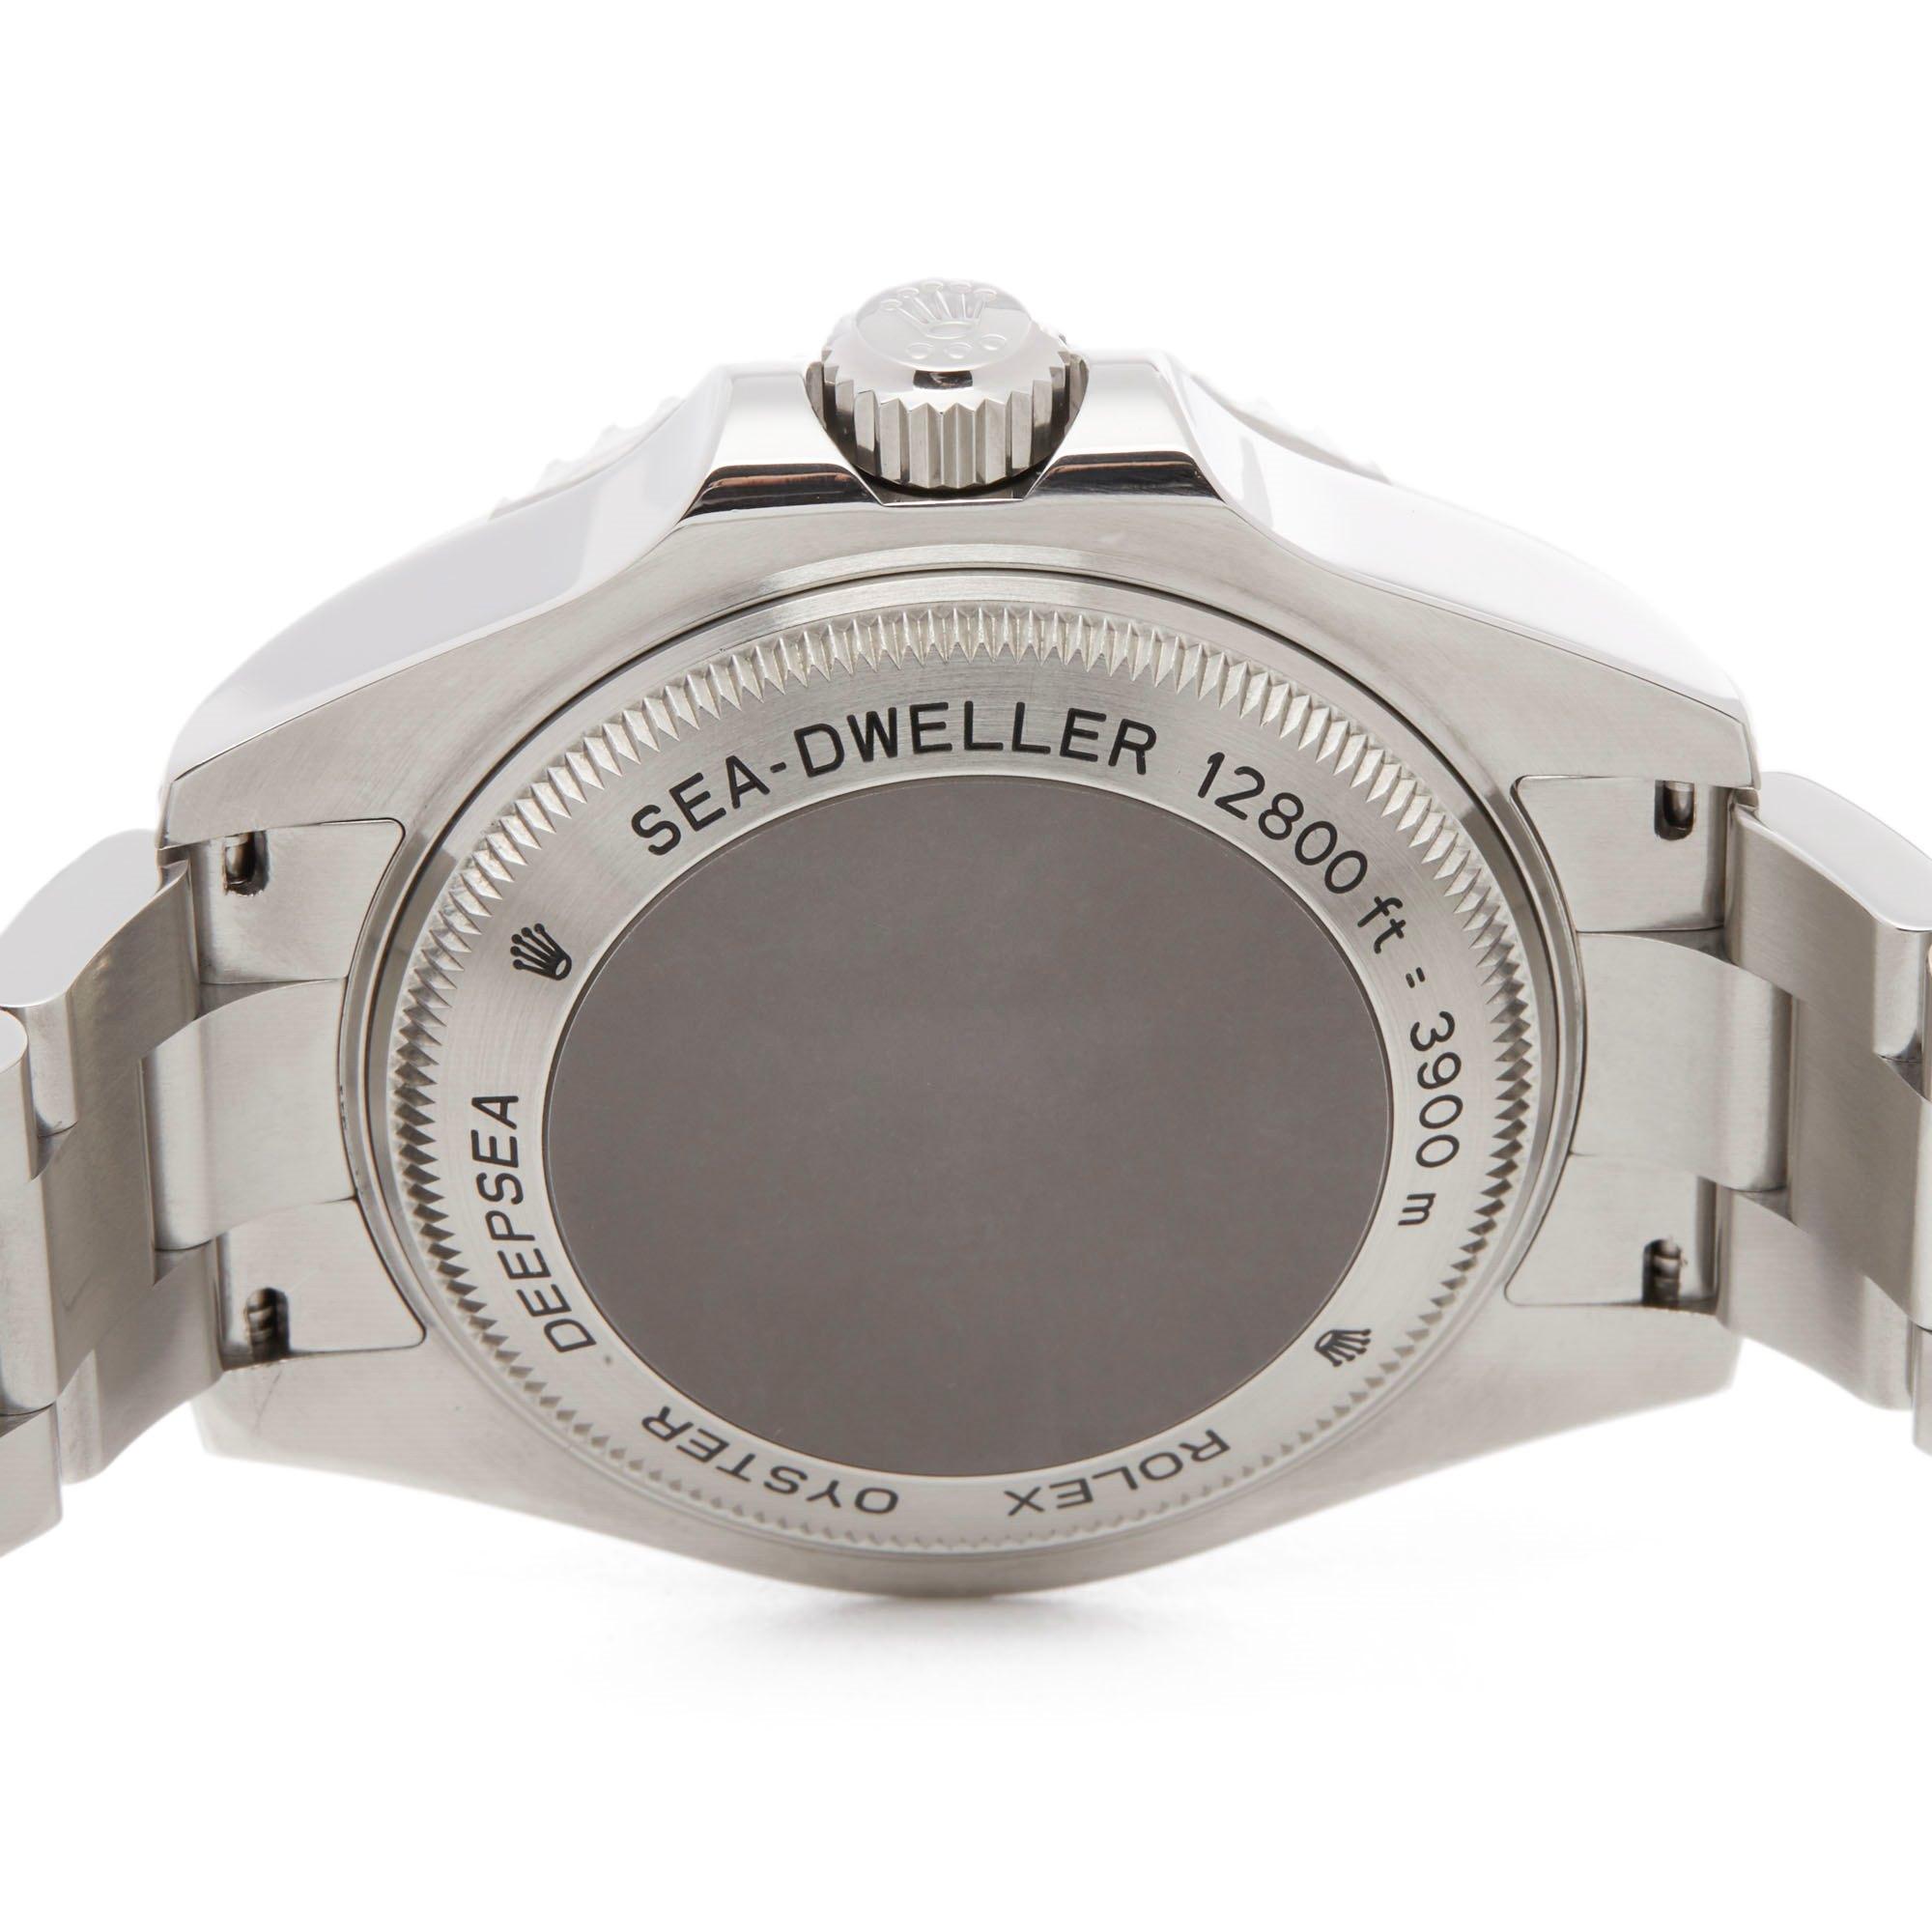 Rolex Sea-Dweller Deep Sea Stainless Steel 116660